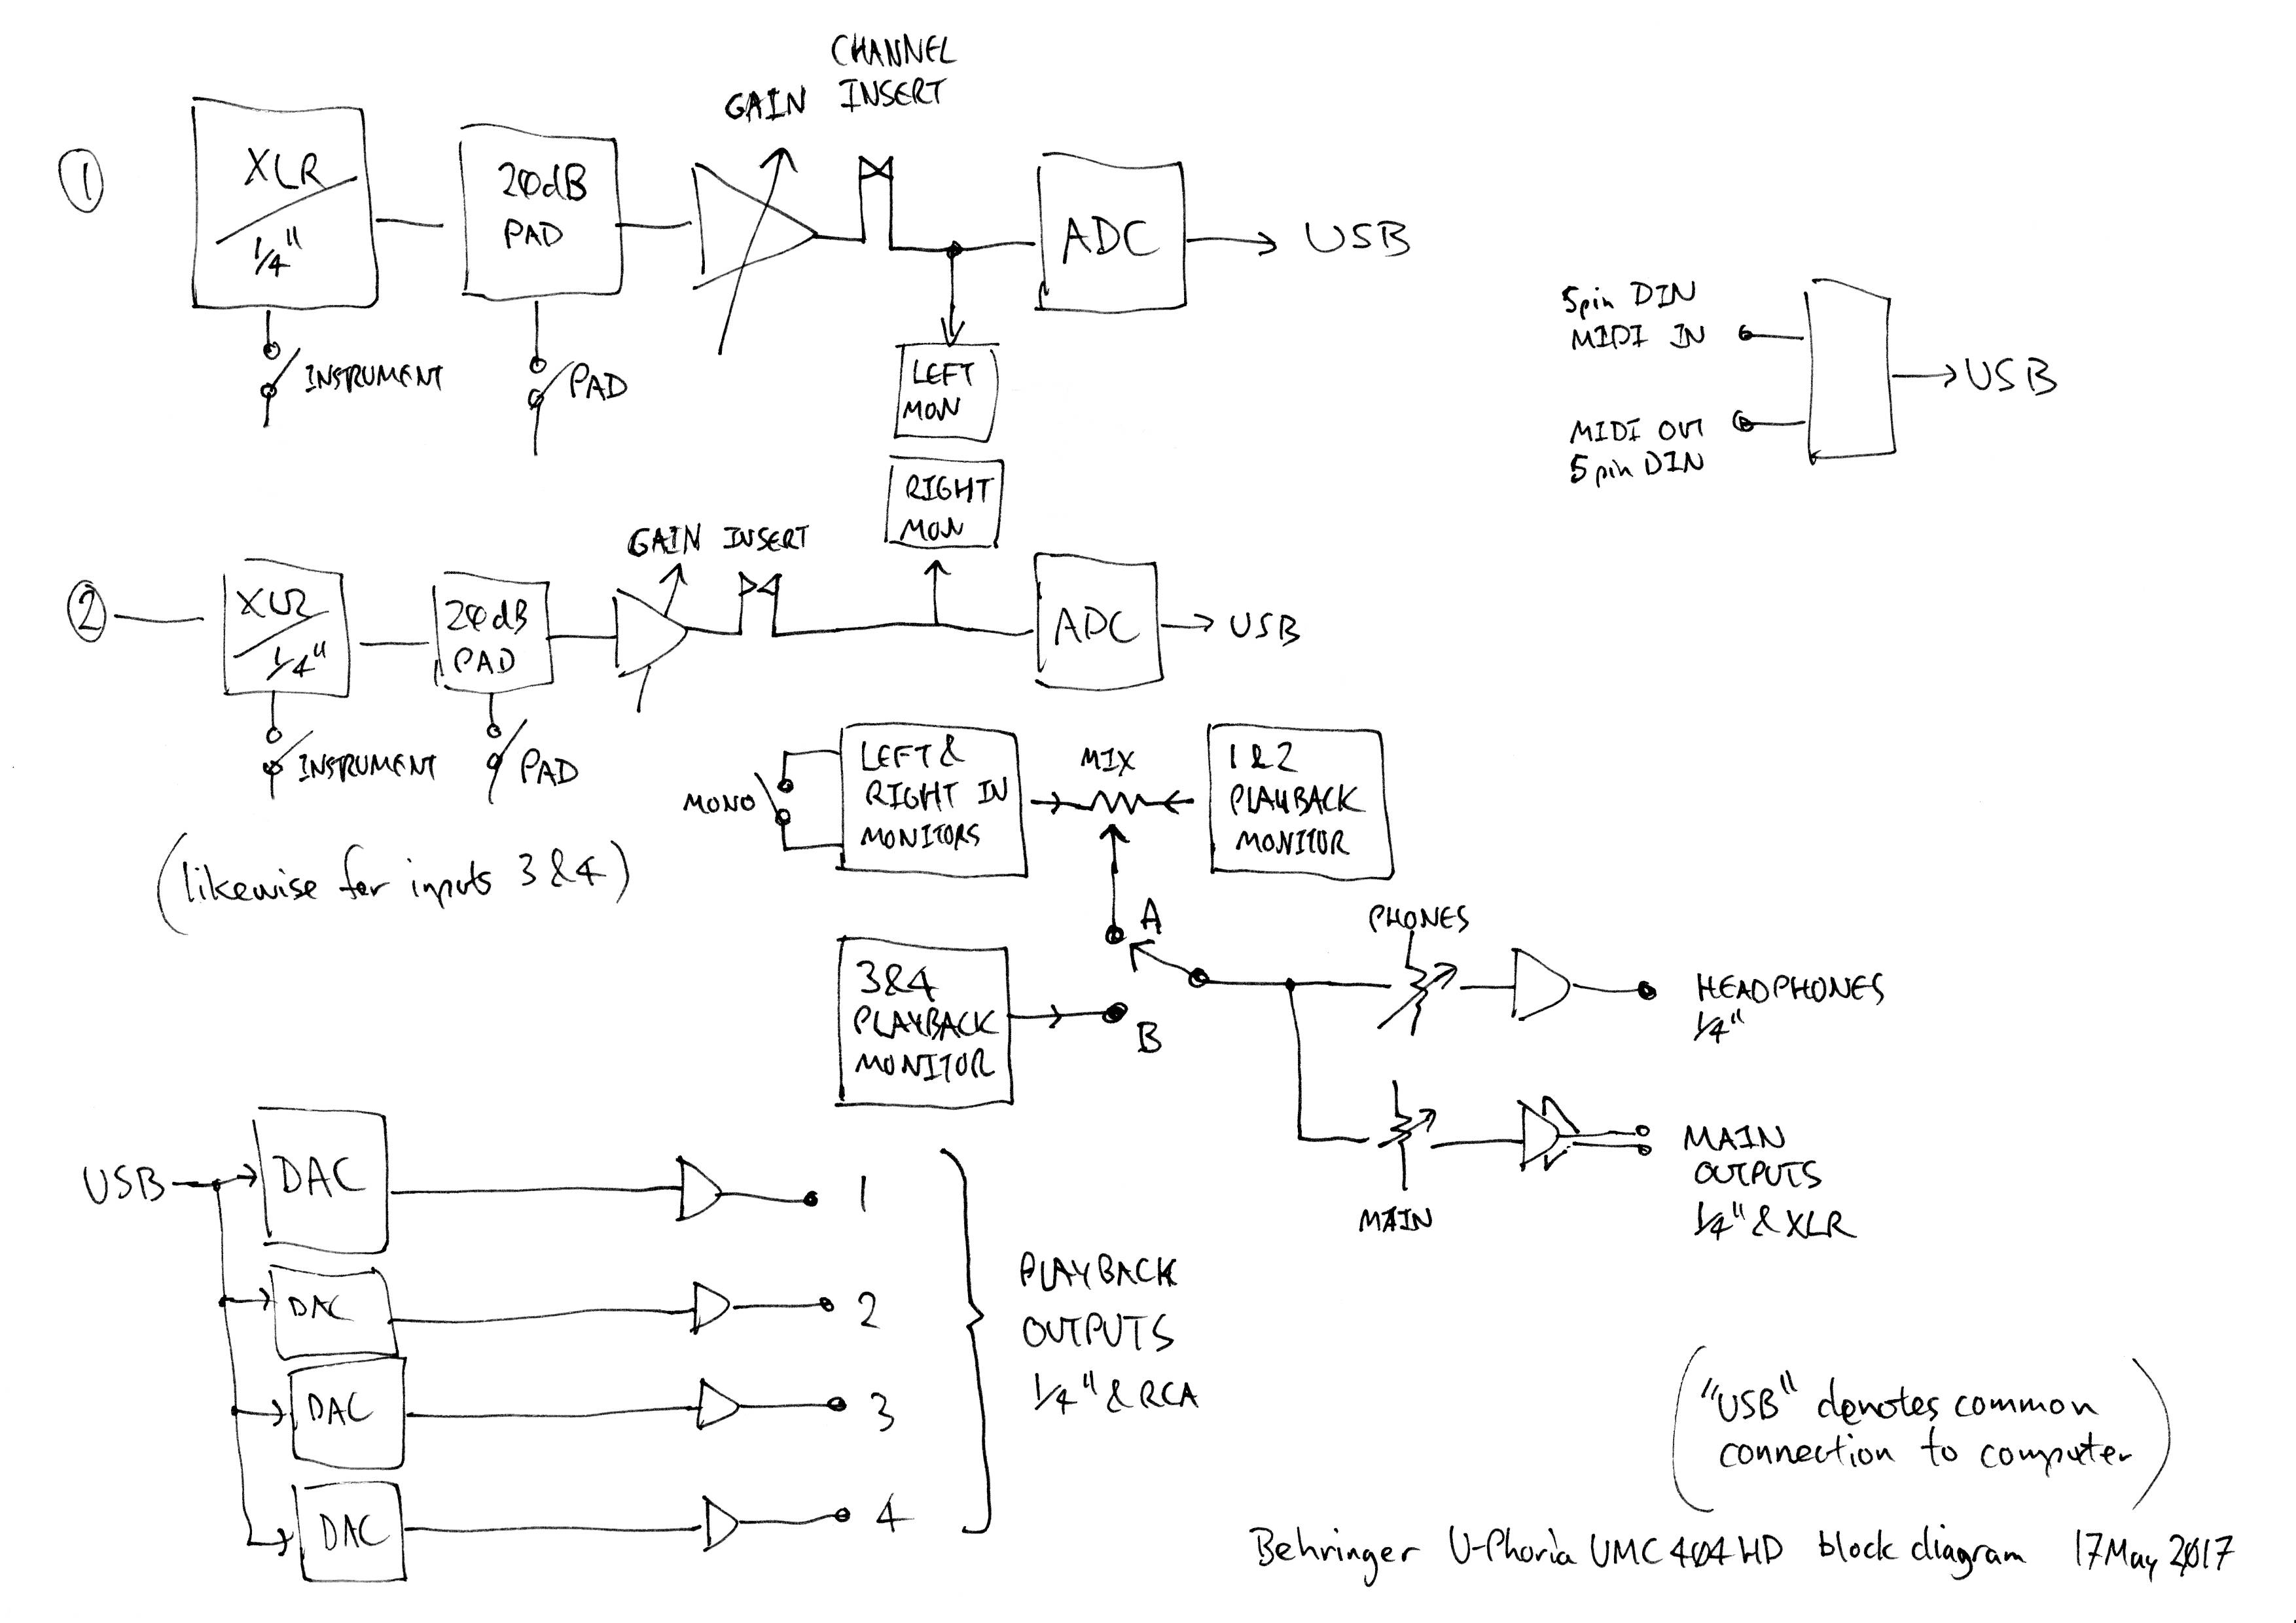 Review Of A Behringer U Phoria Umc404hd Diagram Block Usb Hand Drawn